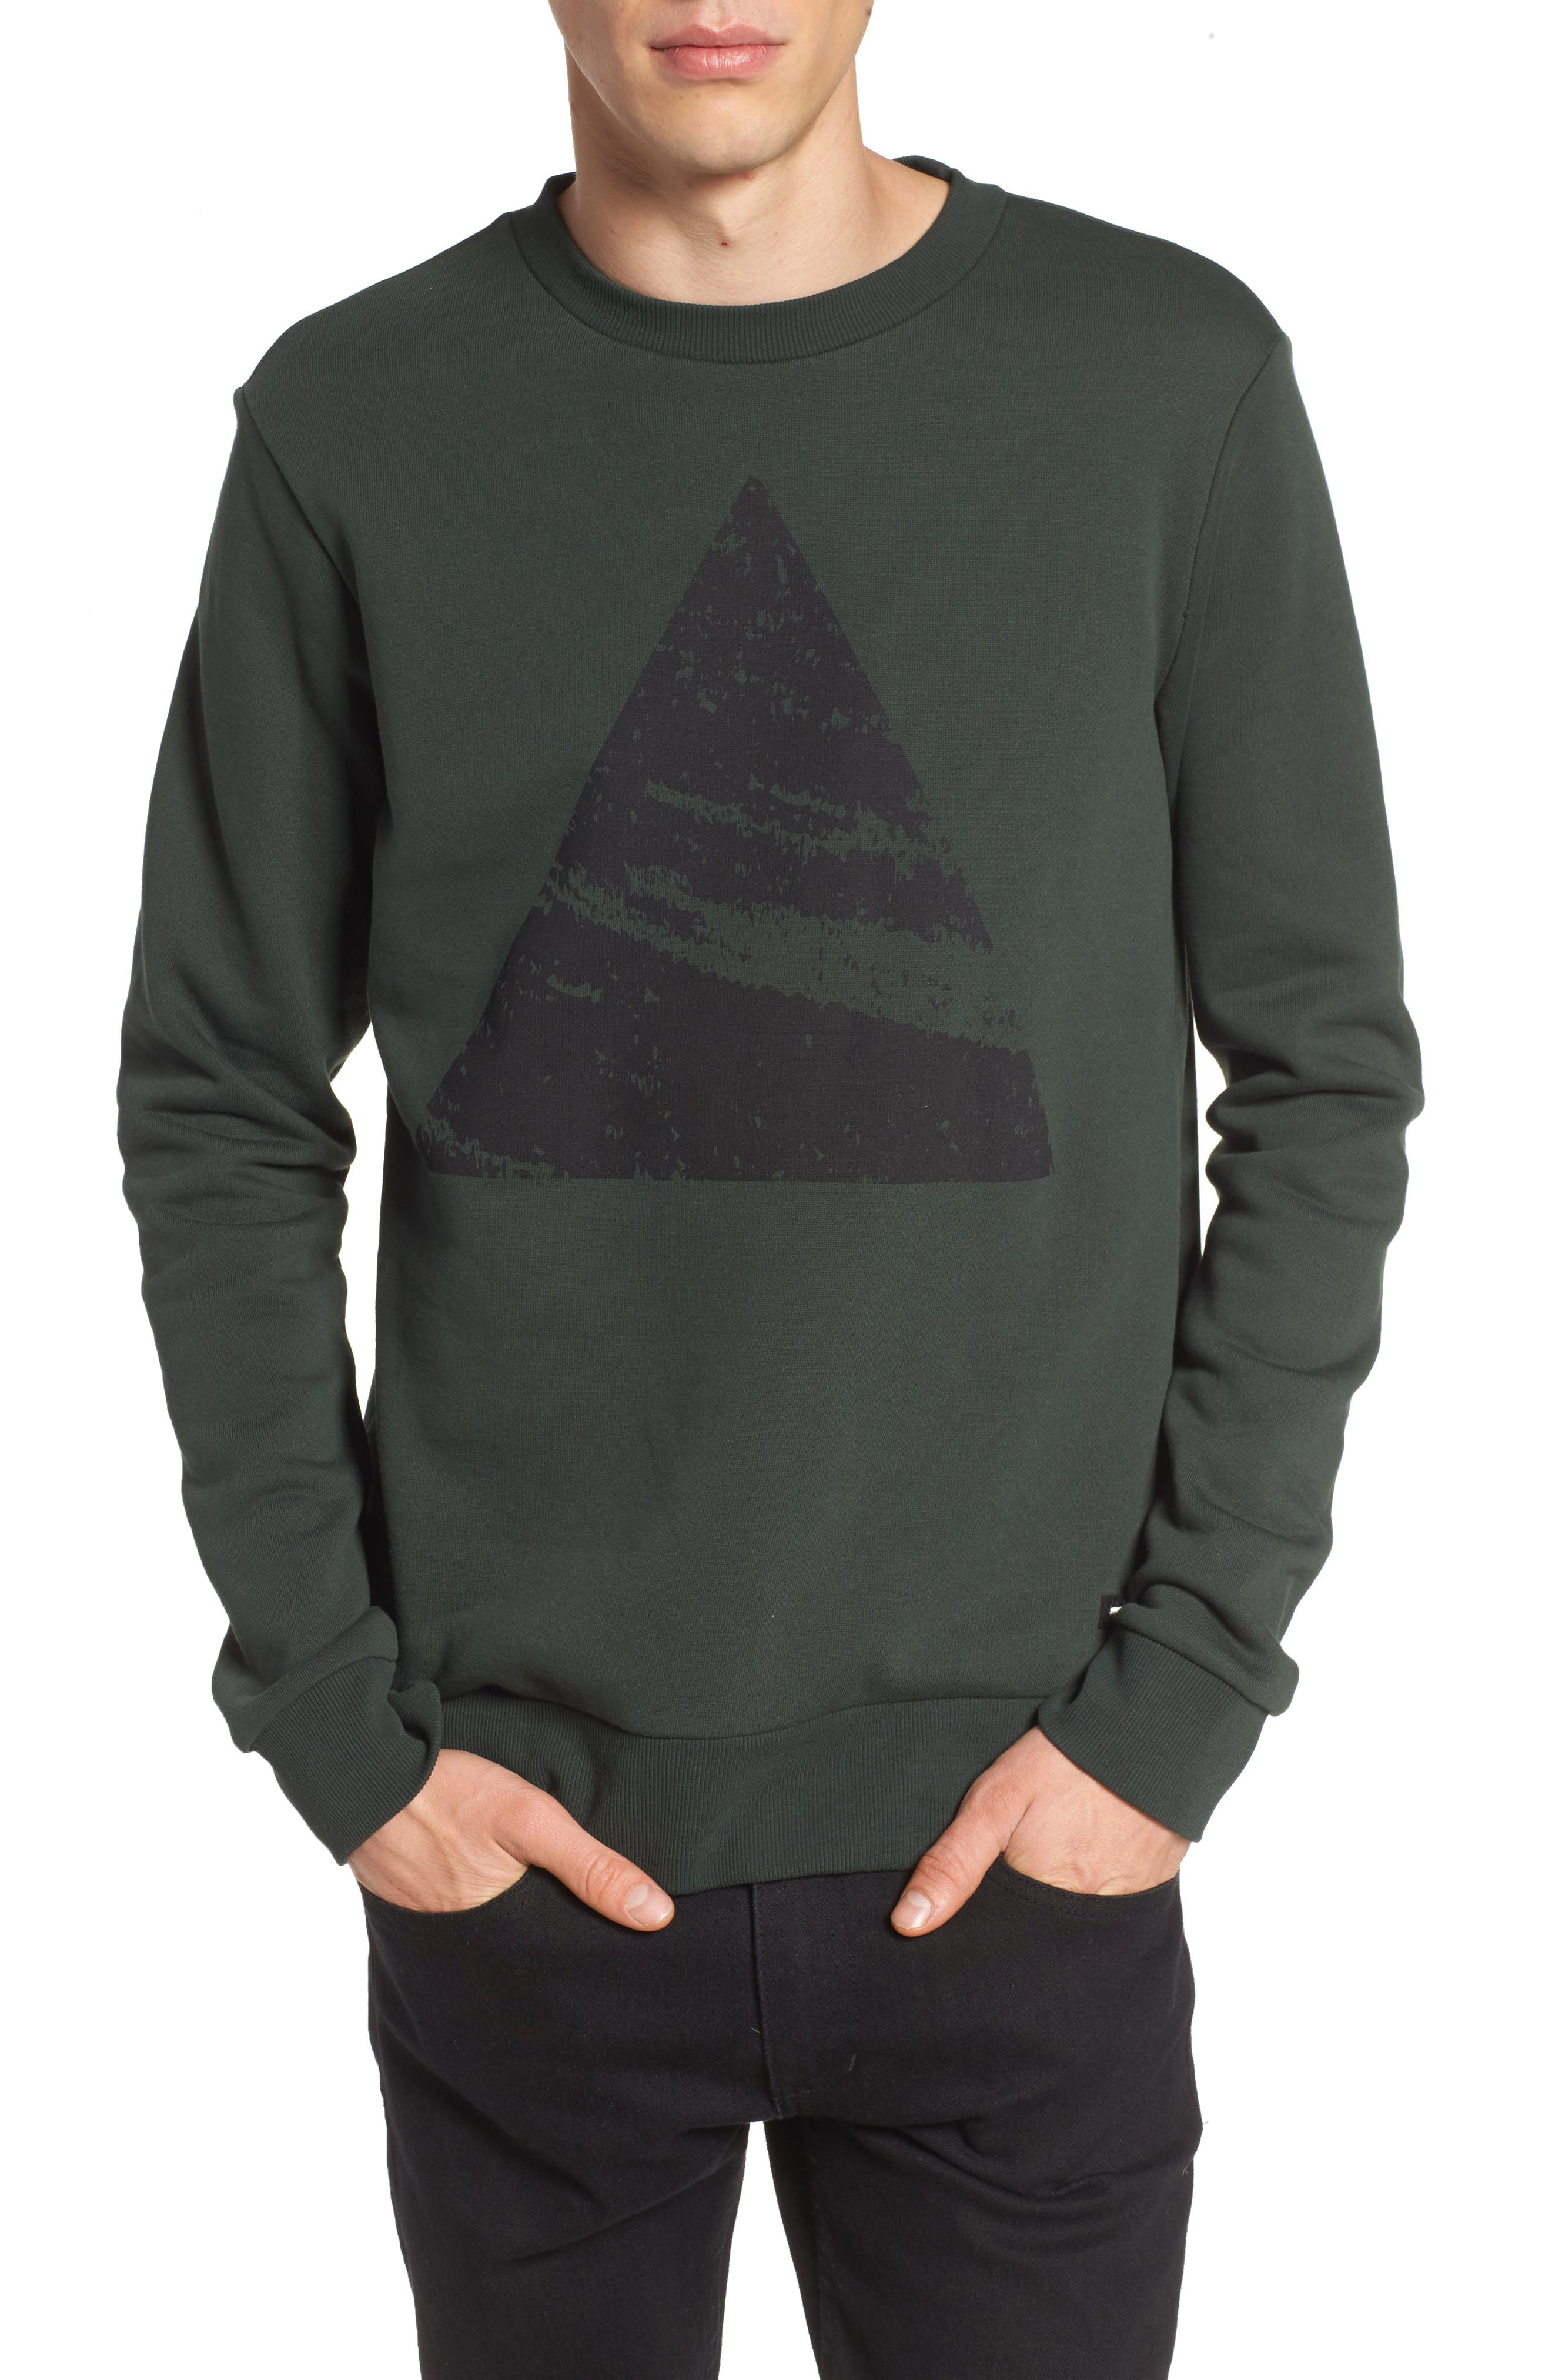 Adrian Sweatshirt,                         Main,                         color, Green Mountain Peak